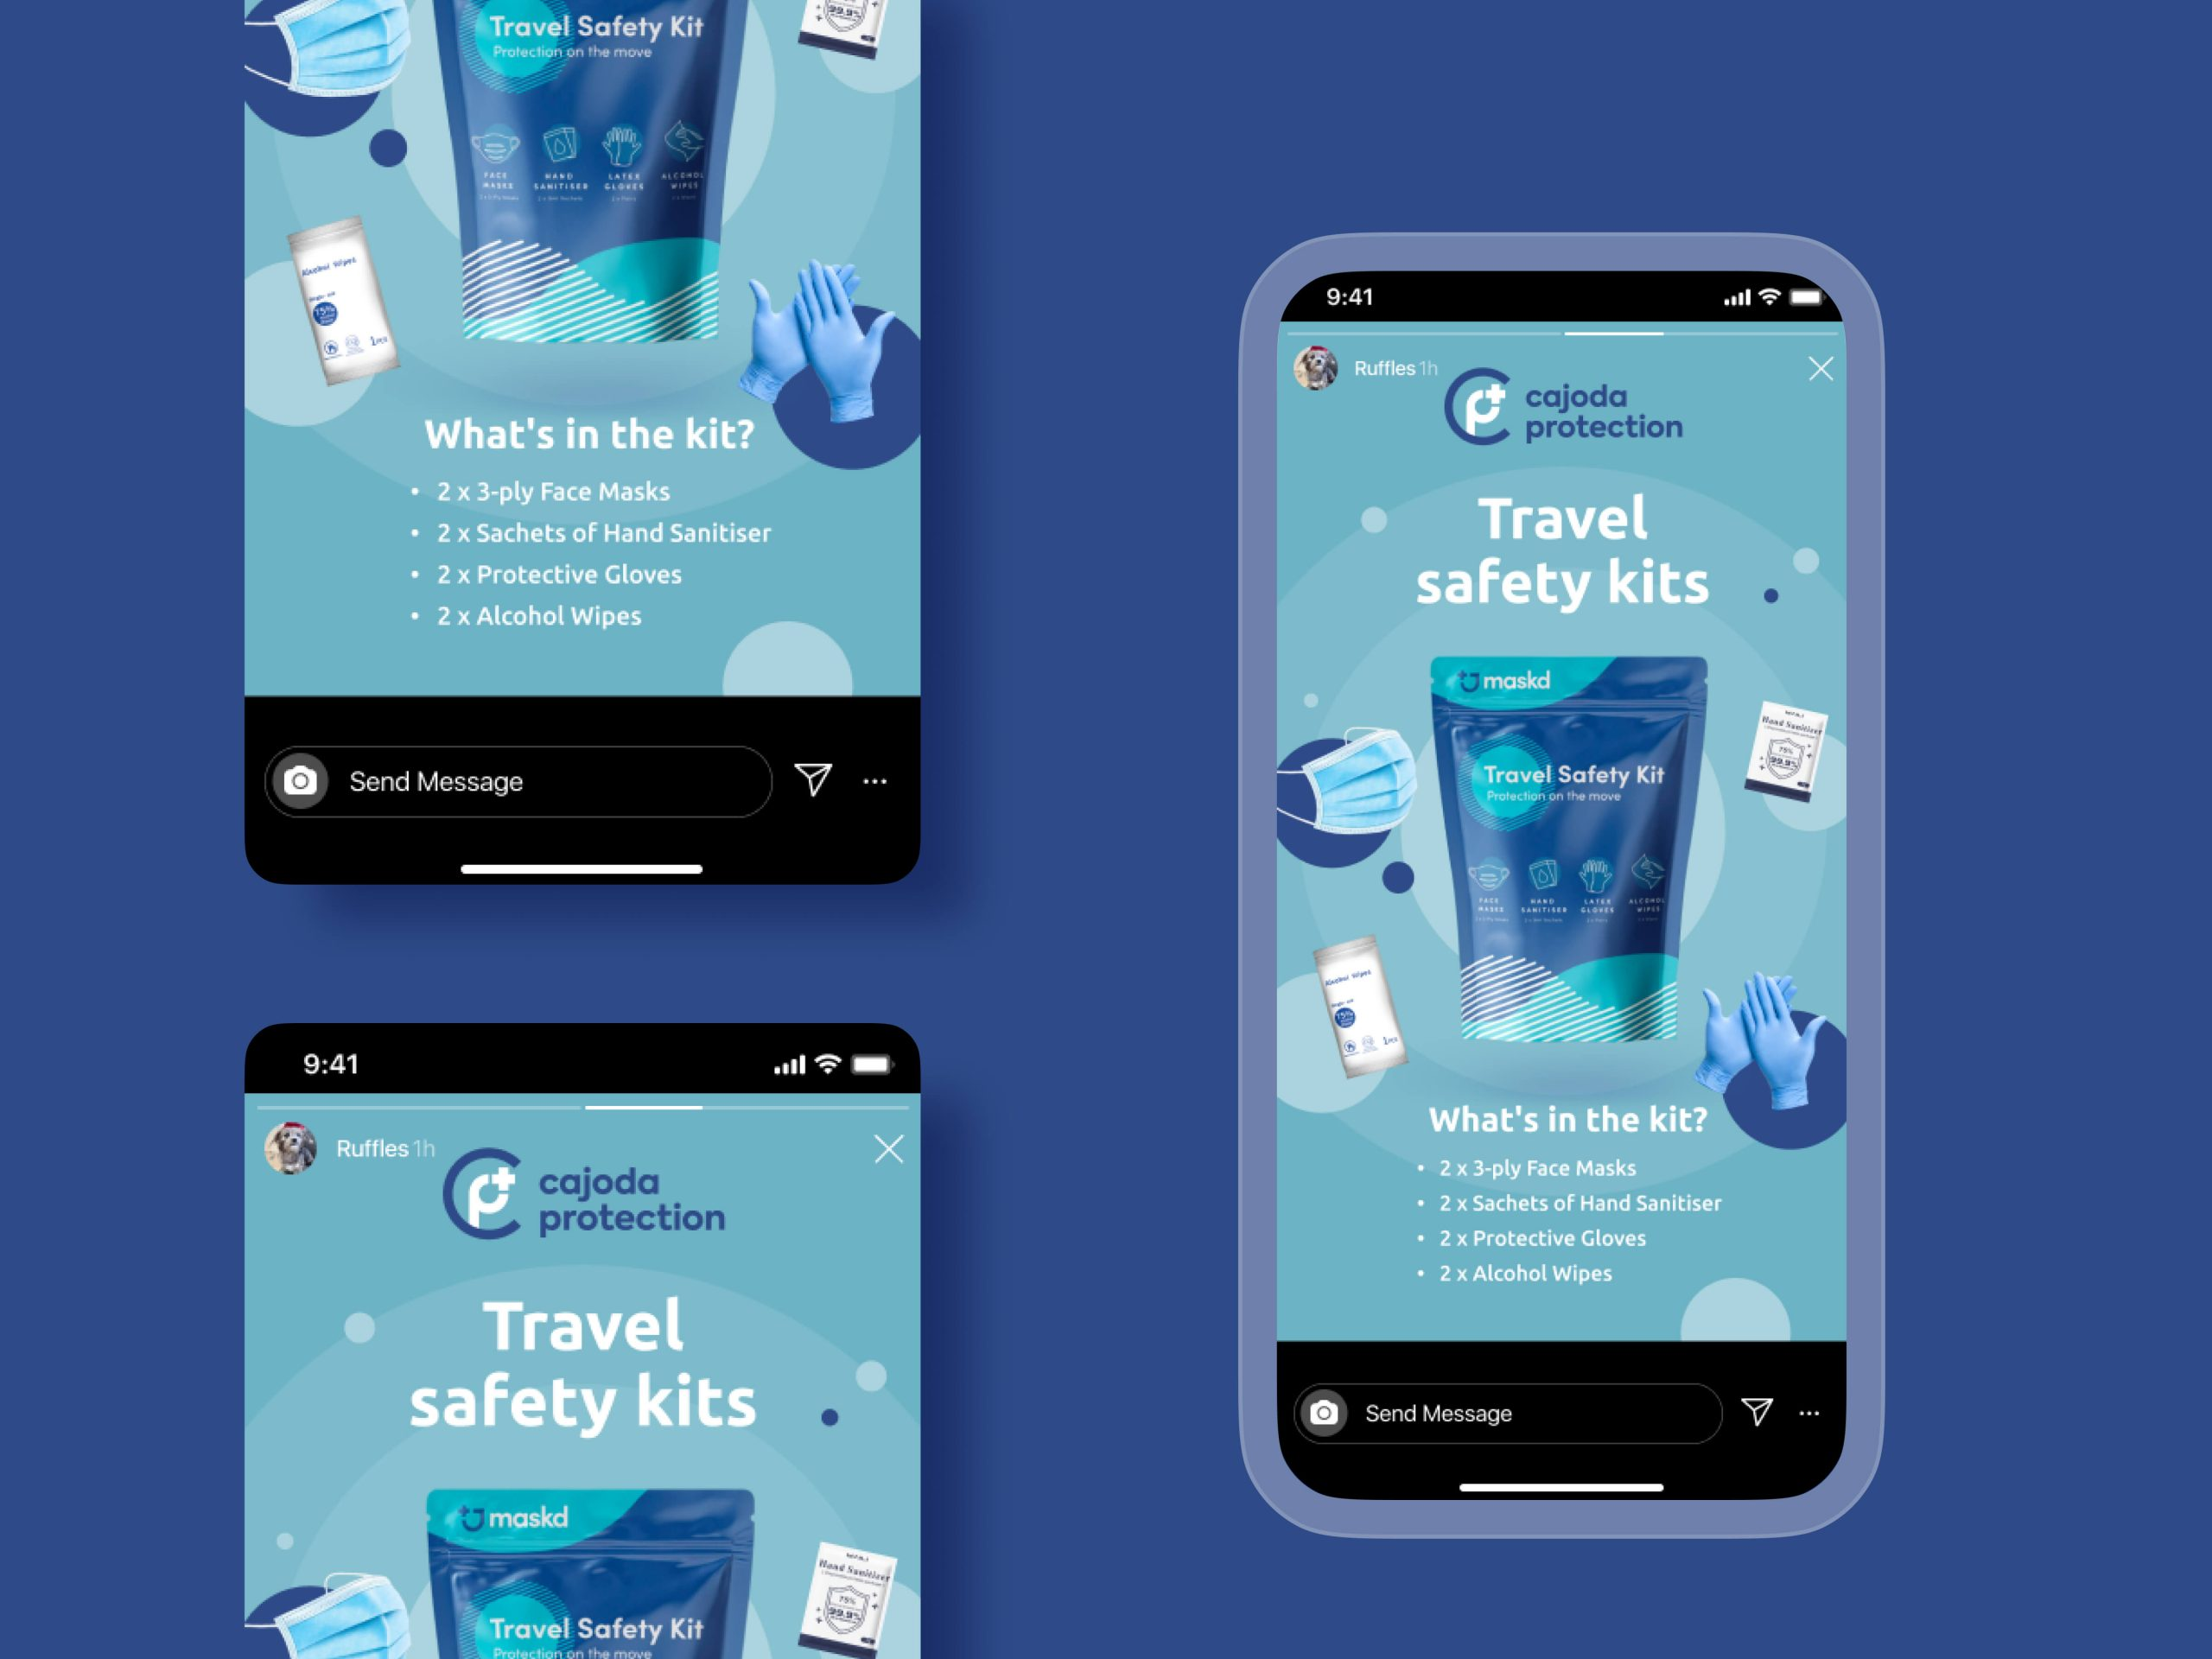 Cajoda Protection Instagram Story Ad Design